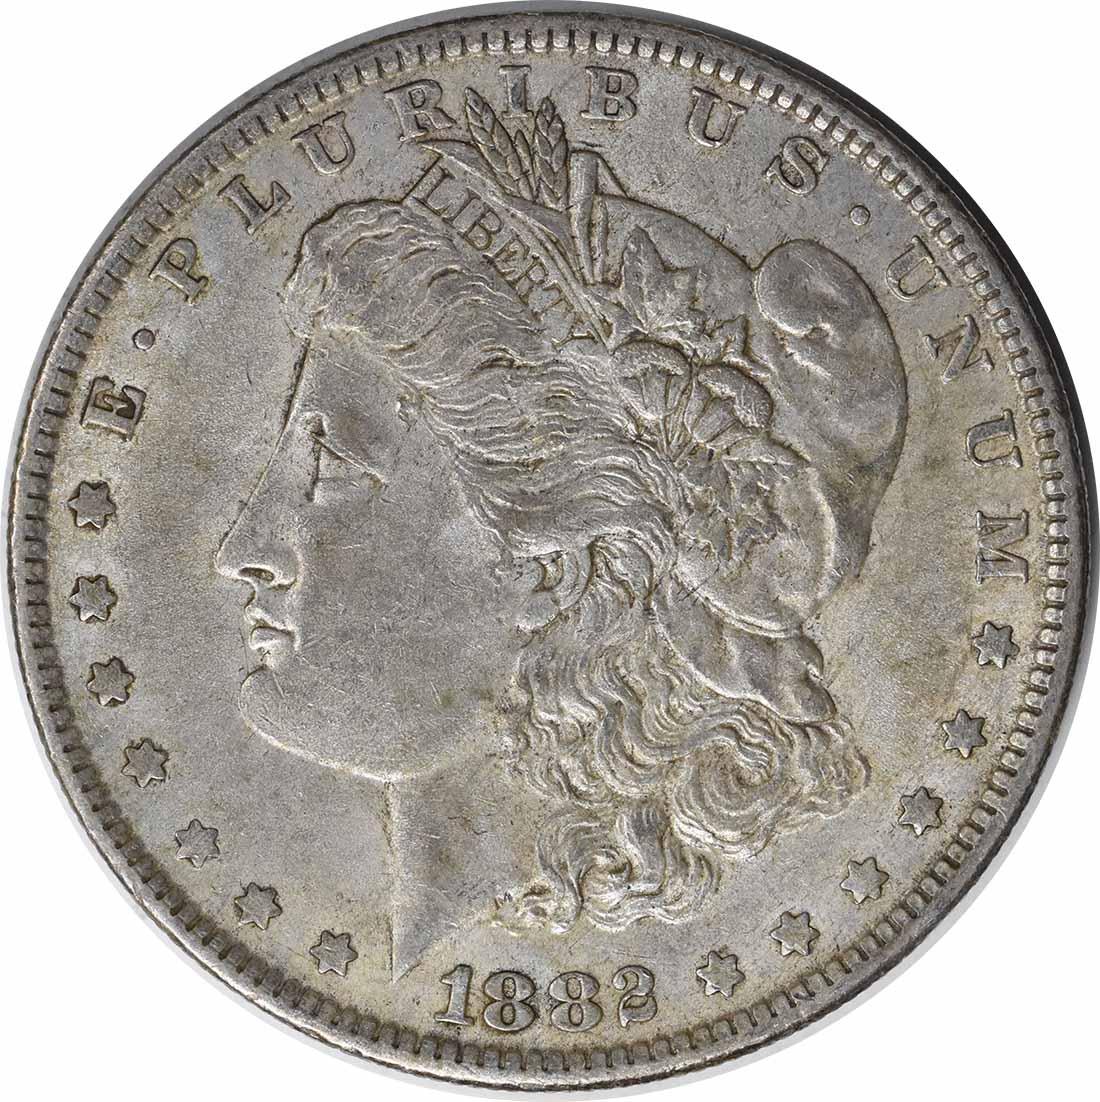 1882-O/S VAM 4 Morgan Silver Dollar O/S Recessed EF Uncertified